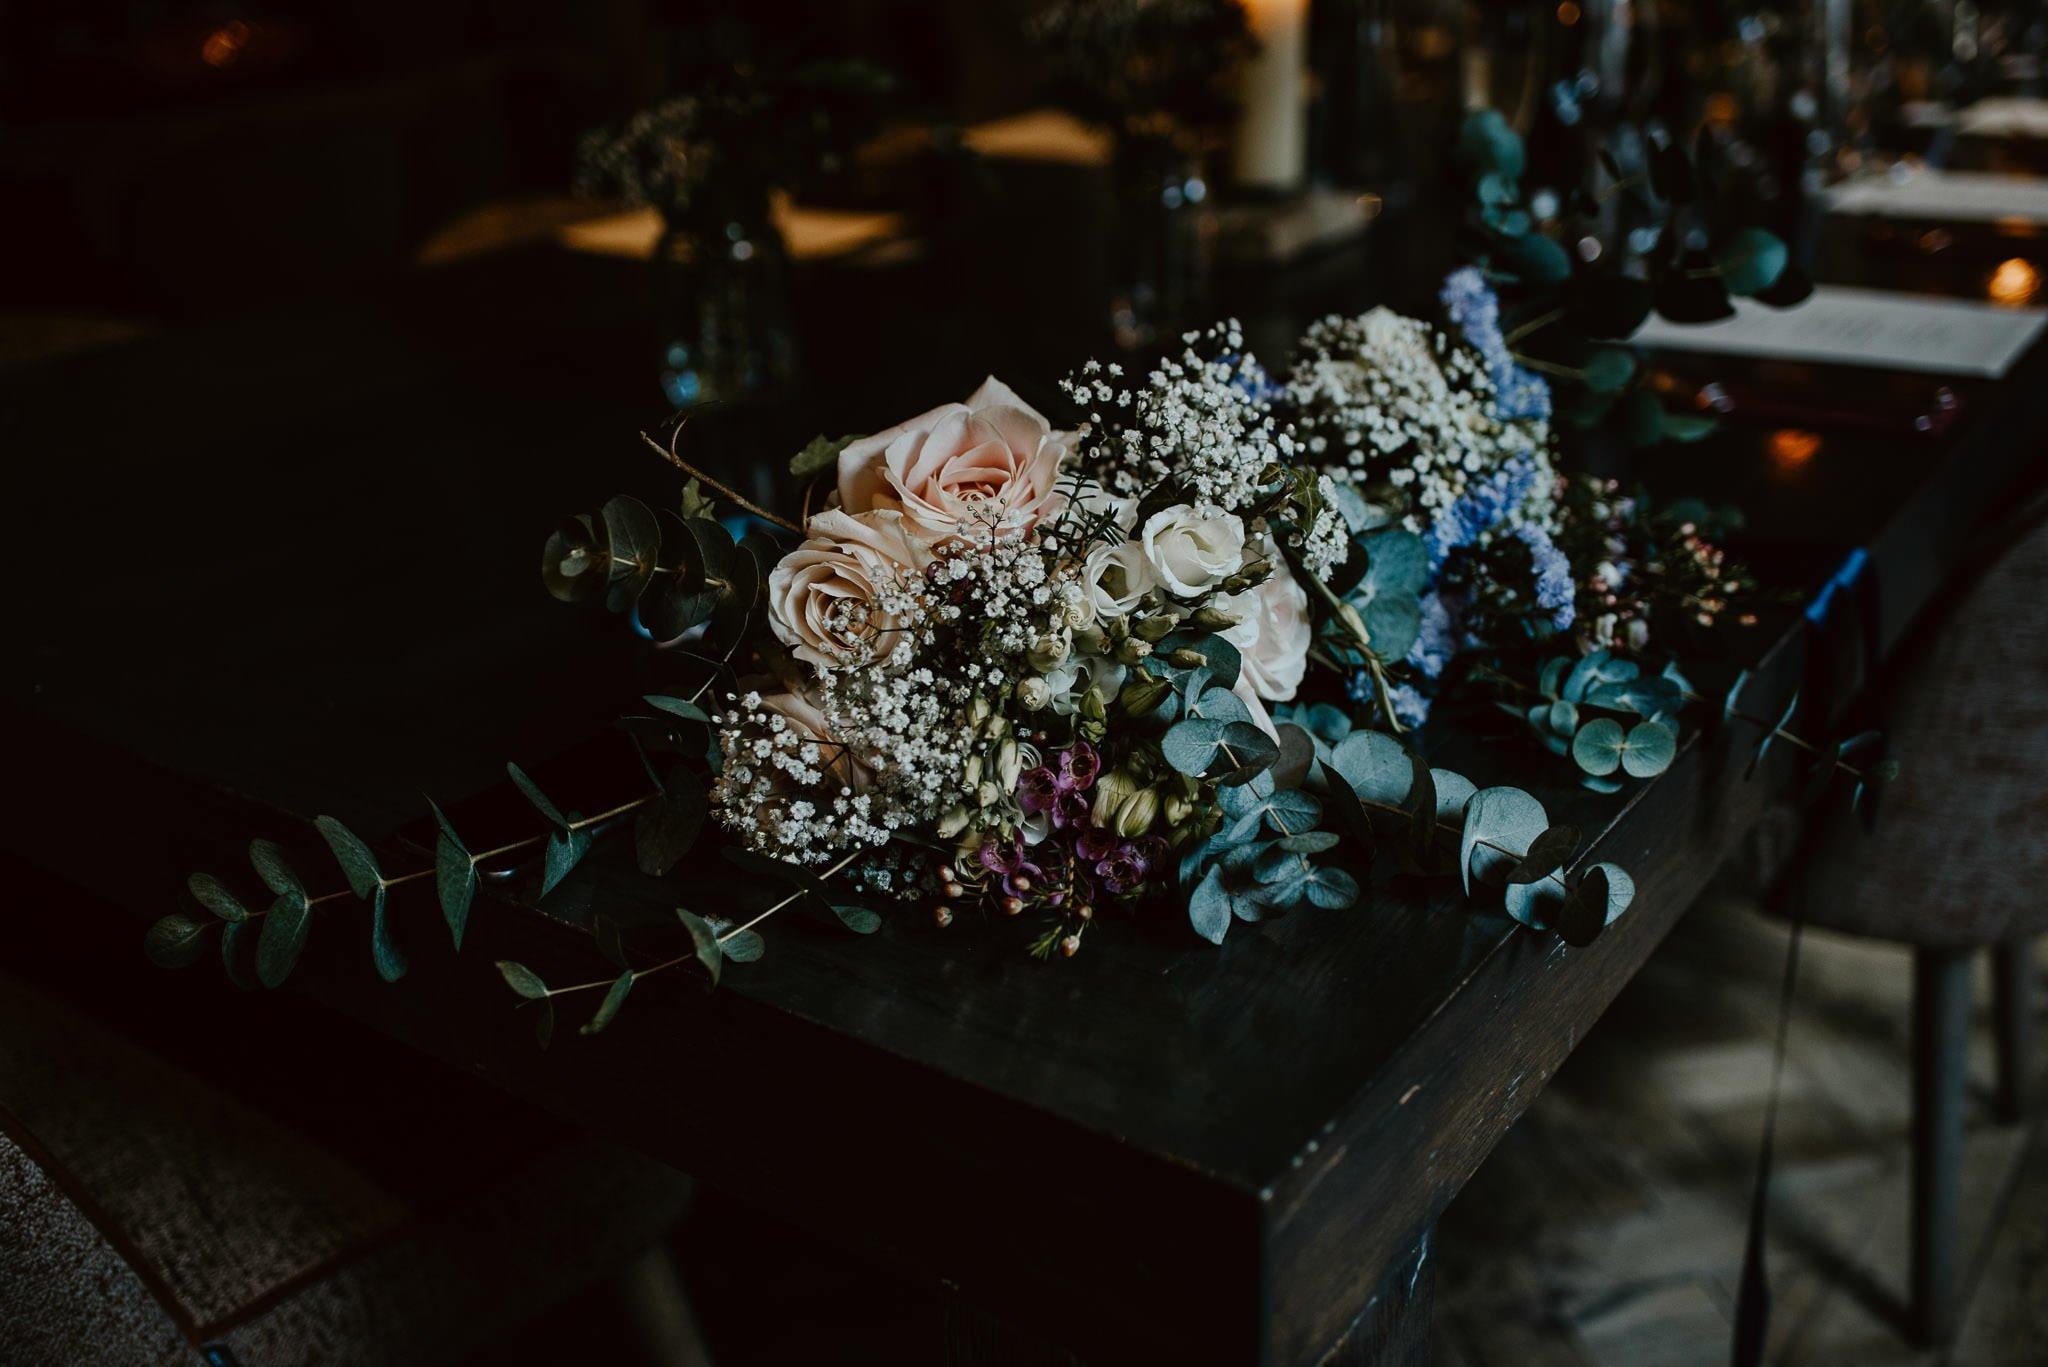 A Dreamy Pre-Raphaelite Wedding at the Bothy in Glasgow 3